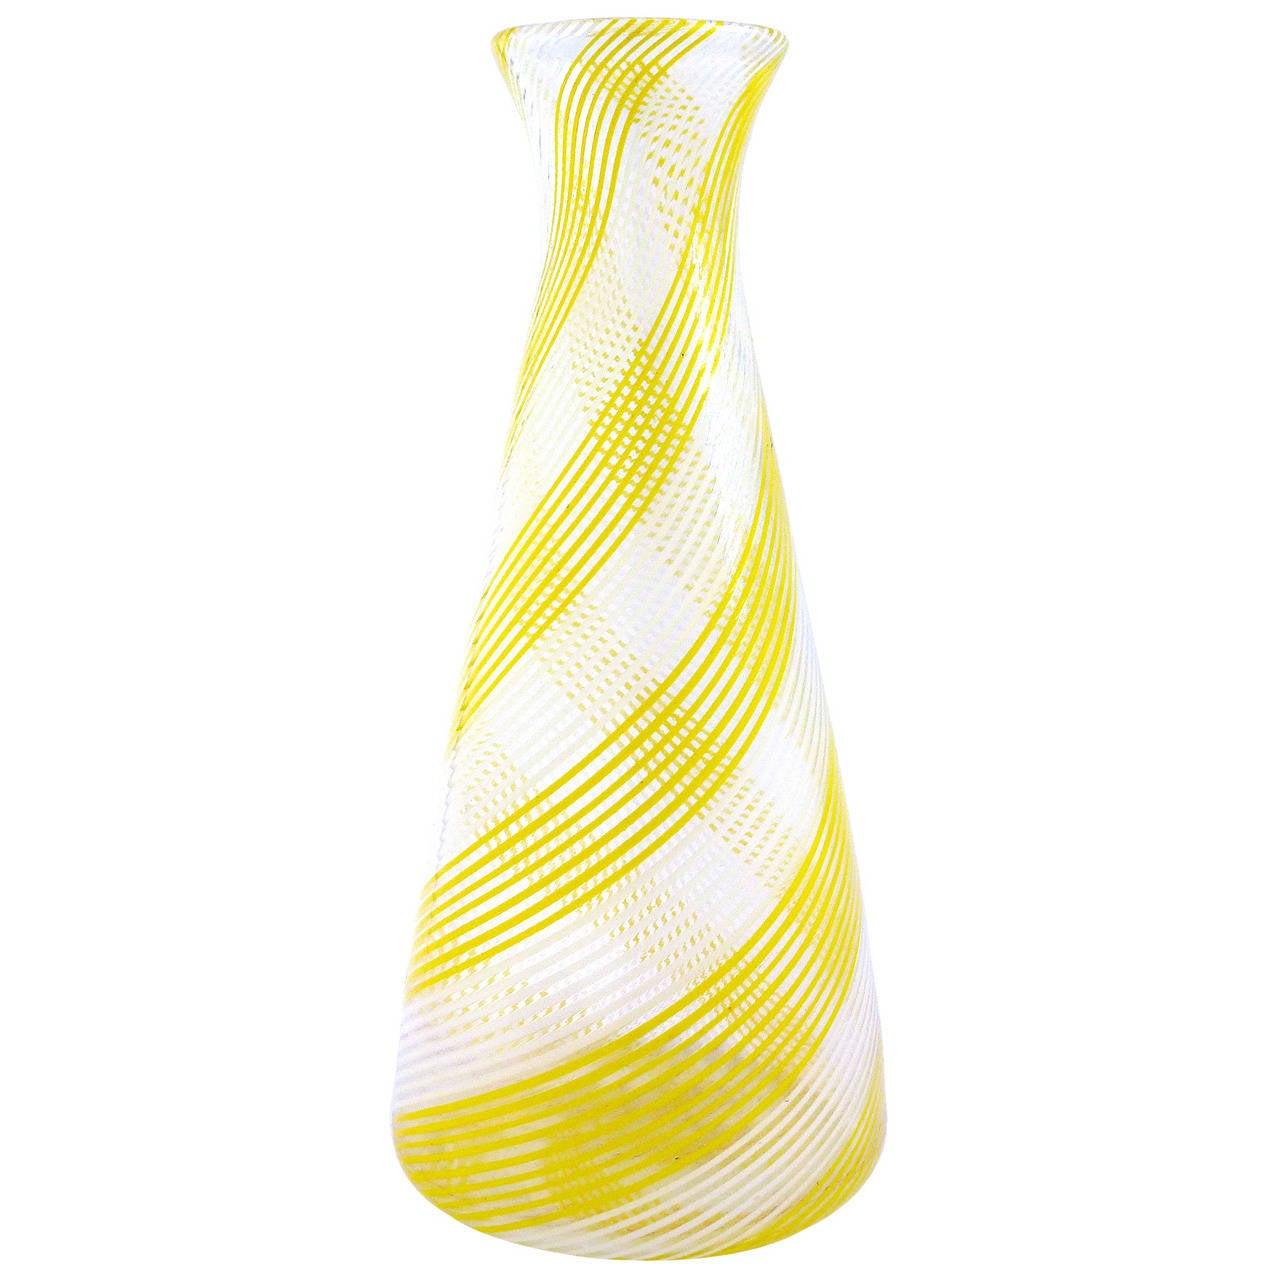 Dino martens aureliano toso murano yellow white italian art glass dino martens aureliano toso murano yellow white italian art glass flower vase for sale reviewsmspy